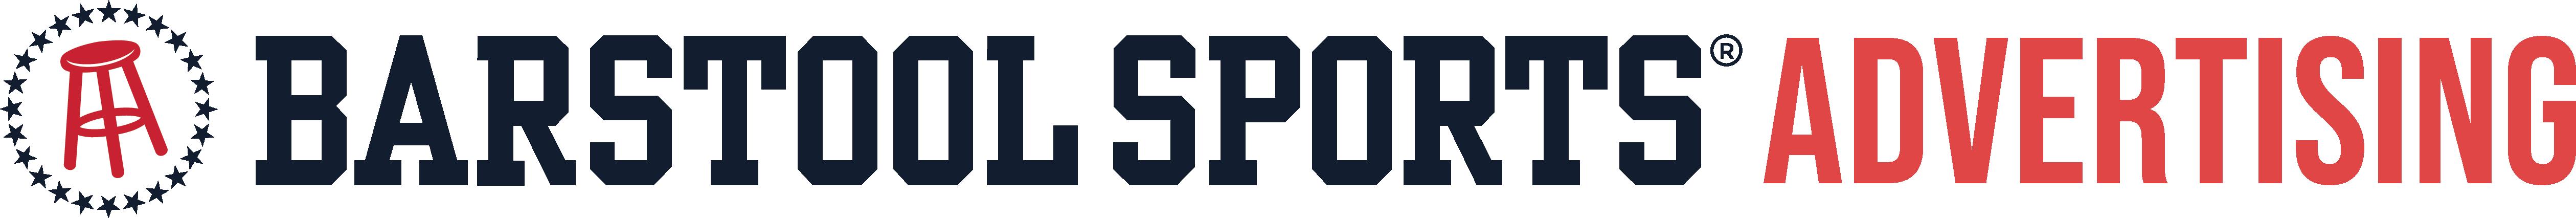 Barstool Sports